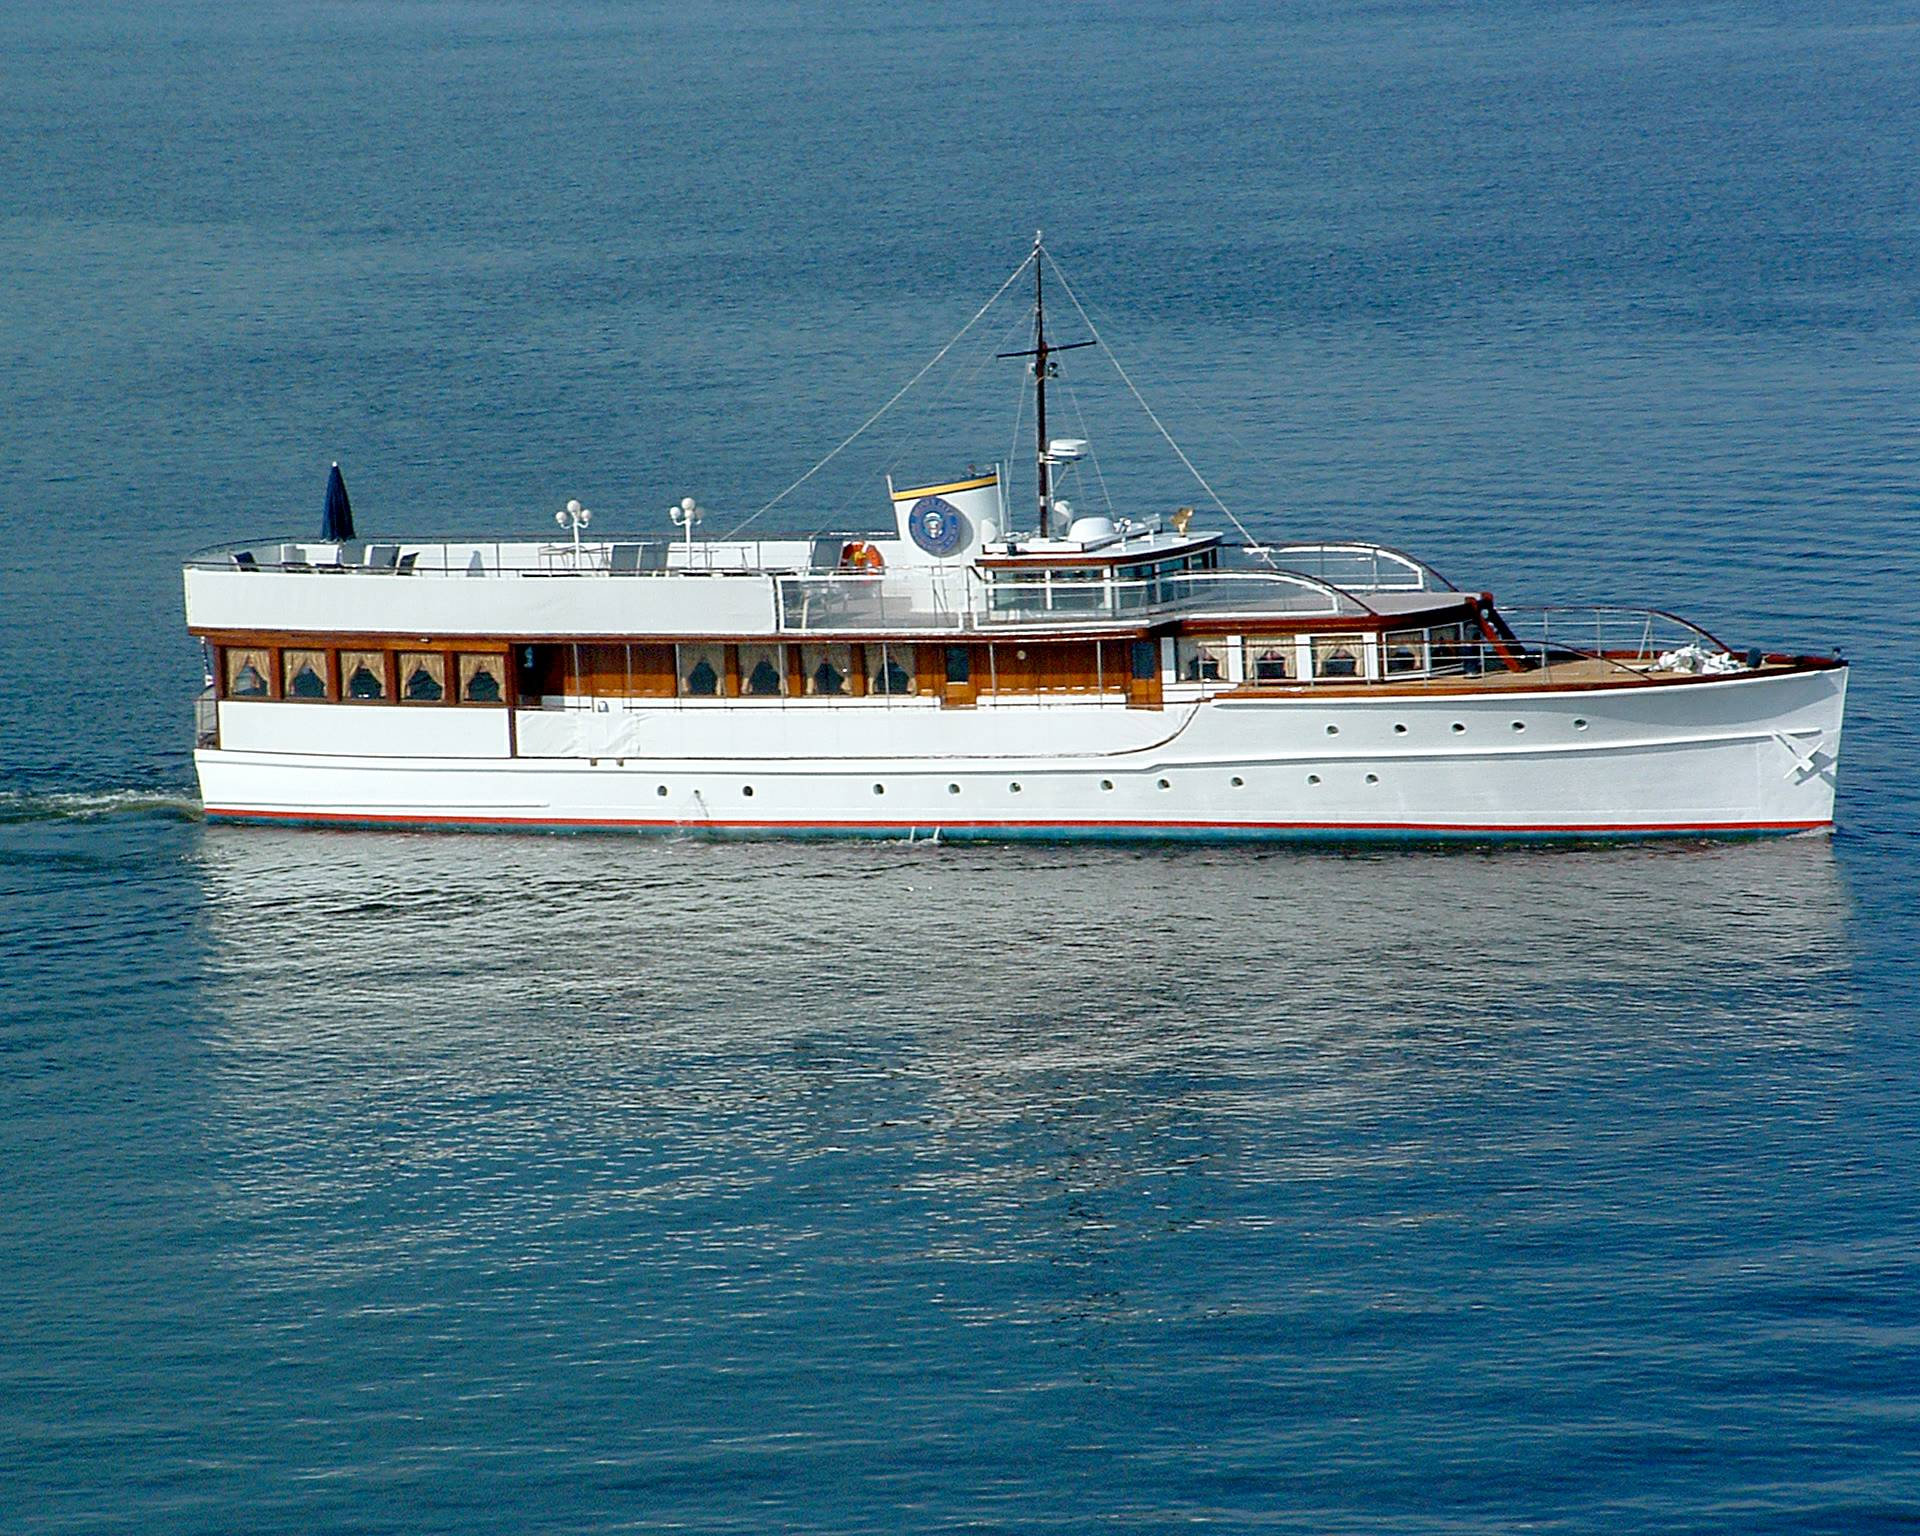 Restored 1931 Defoe wooden yacht Honey Fitz